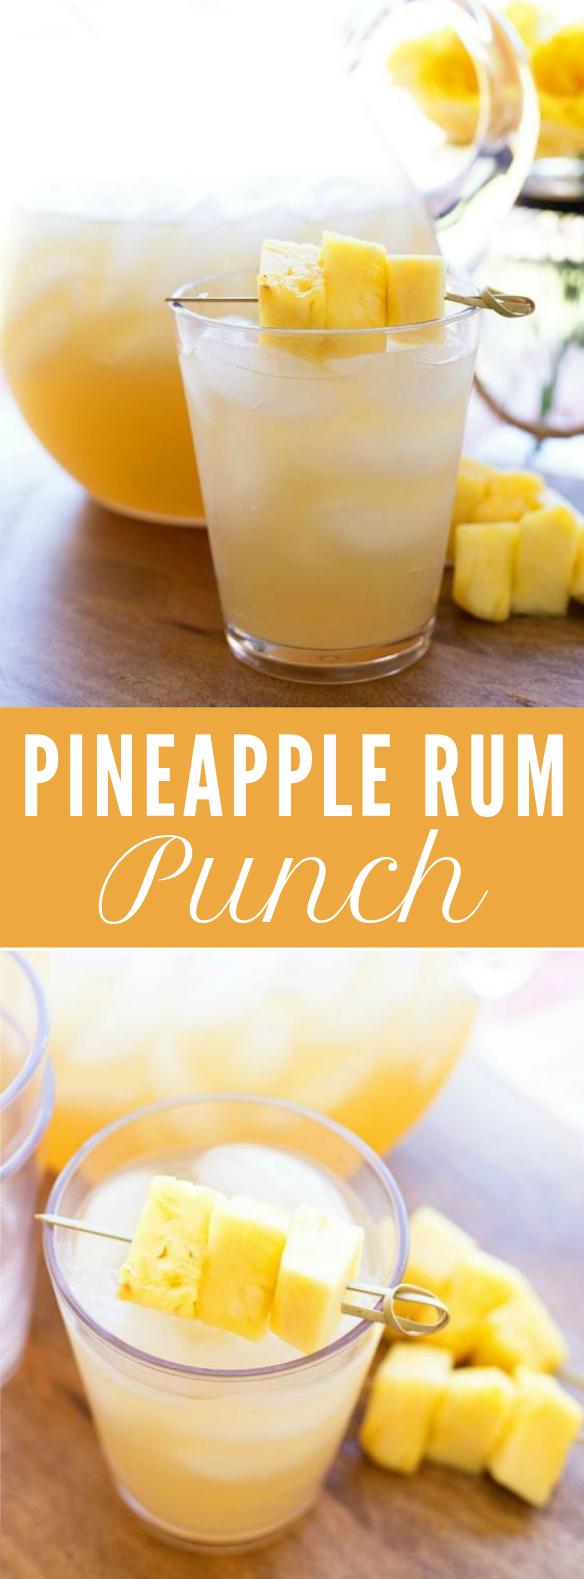 Pineapple Rum Punch #Pineapple #PartyDrink